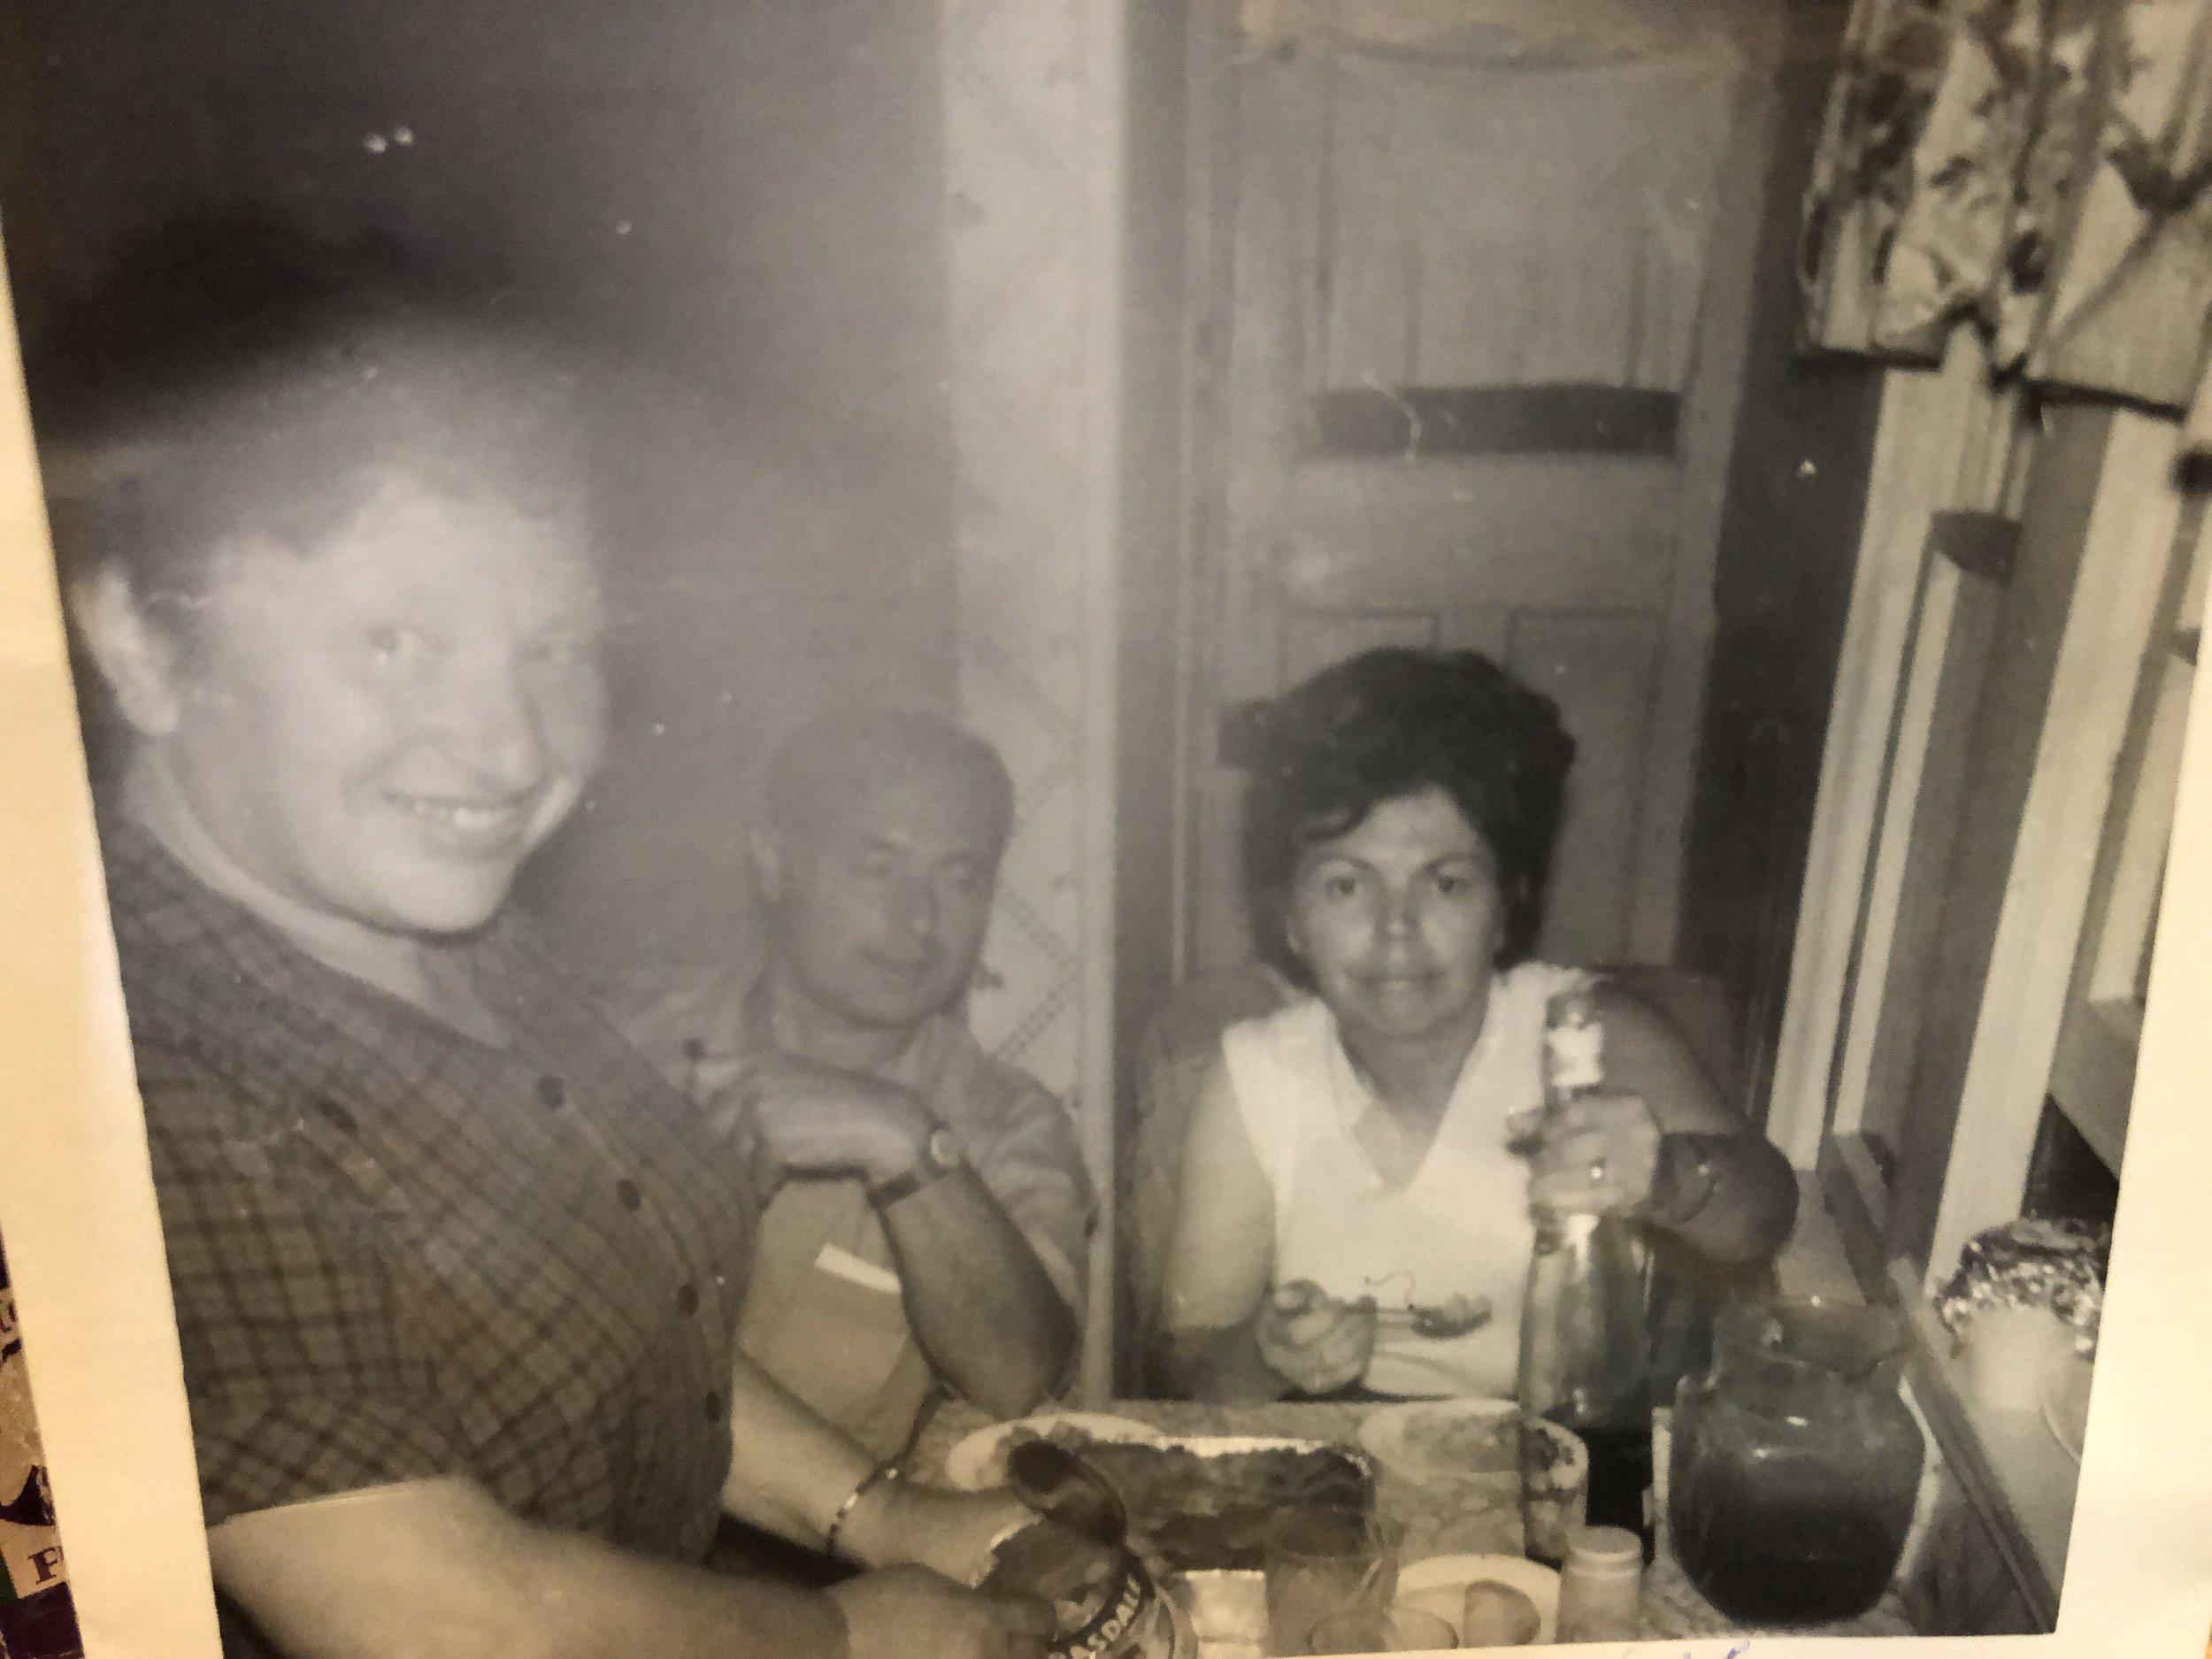 My mother entertaining Lou and Sarah Weber Mundlein's Bungalows White Lake, N.Y. 1966